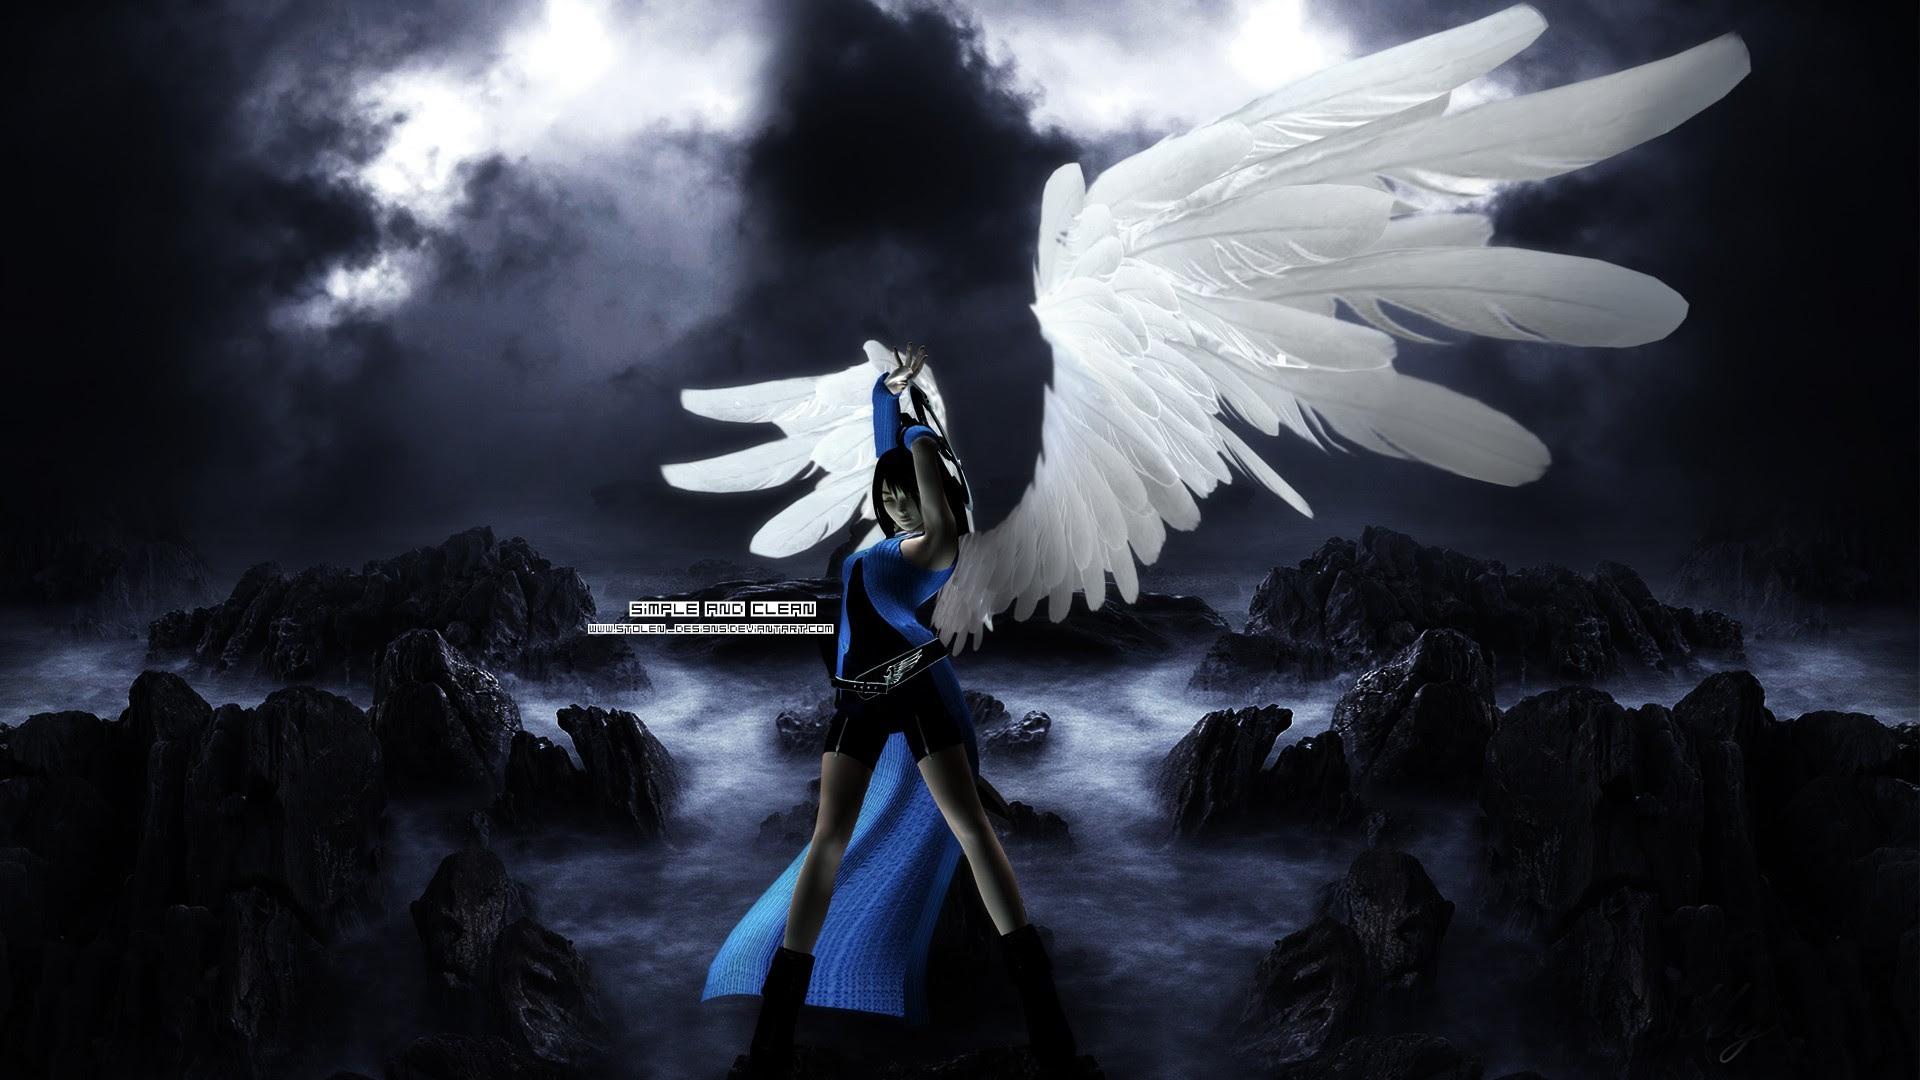 Final Fantasy 8 Wallpaper Hd 76 Images